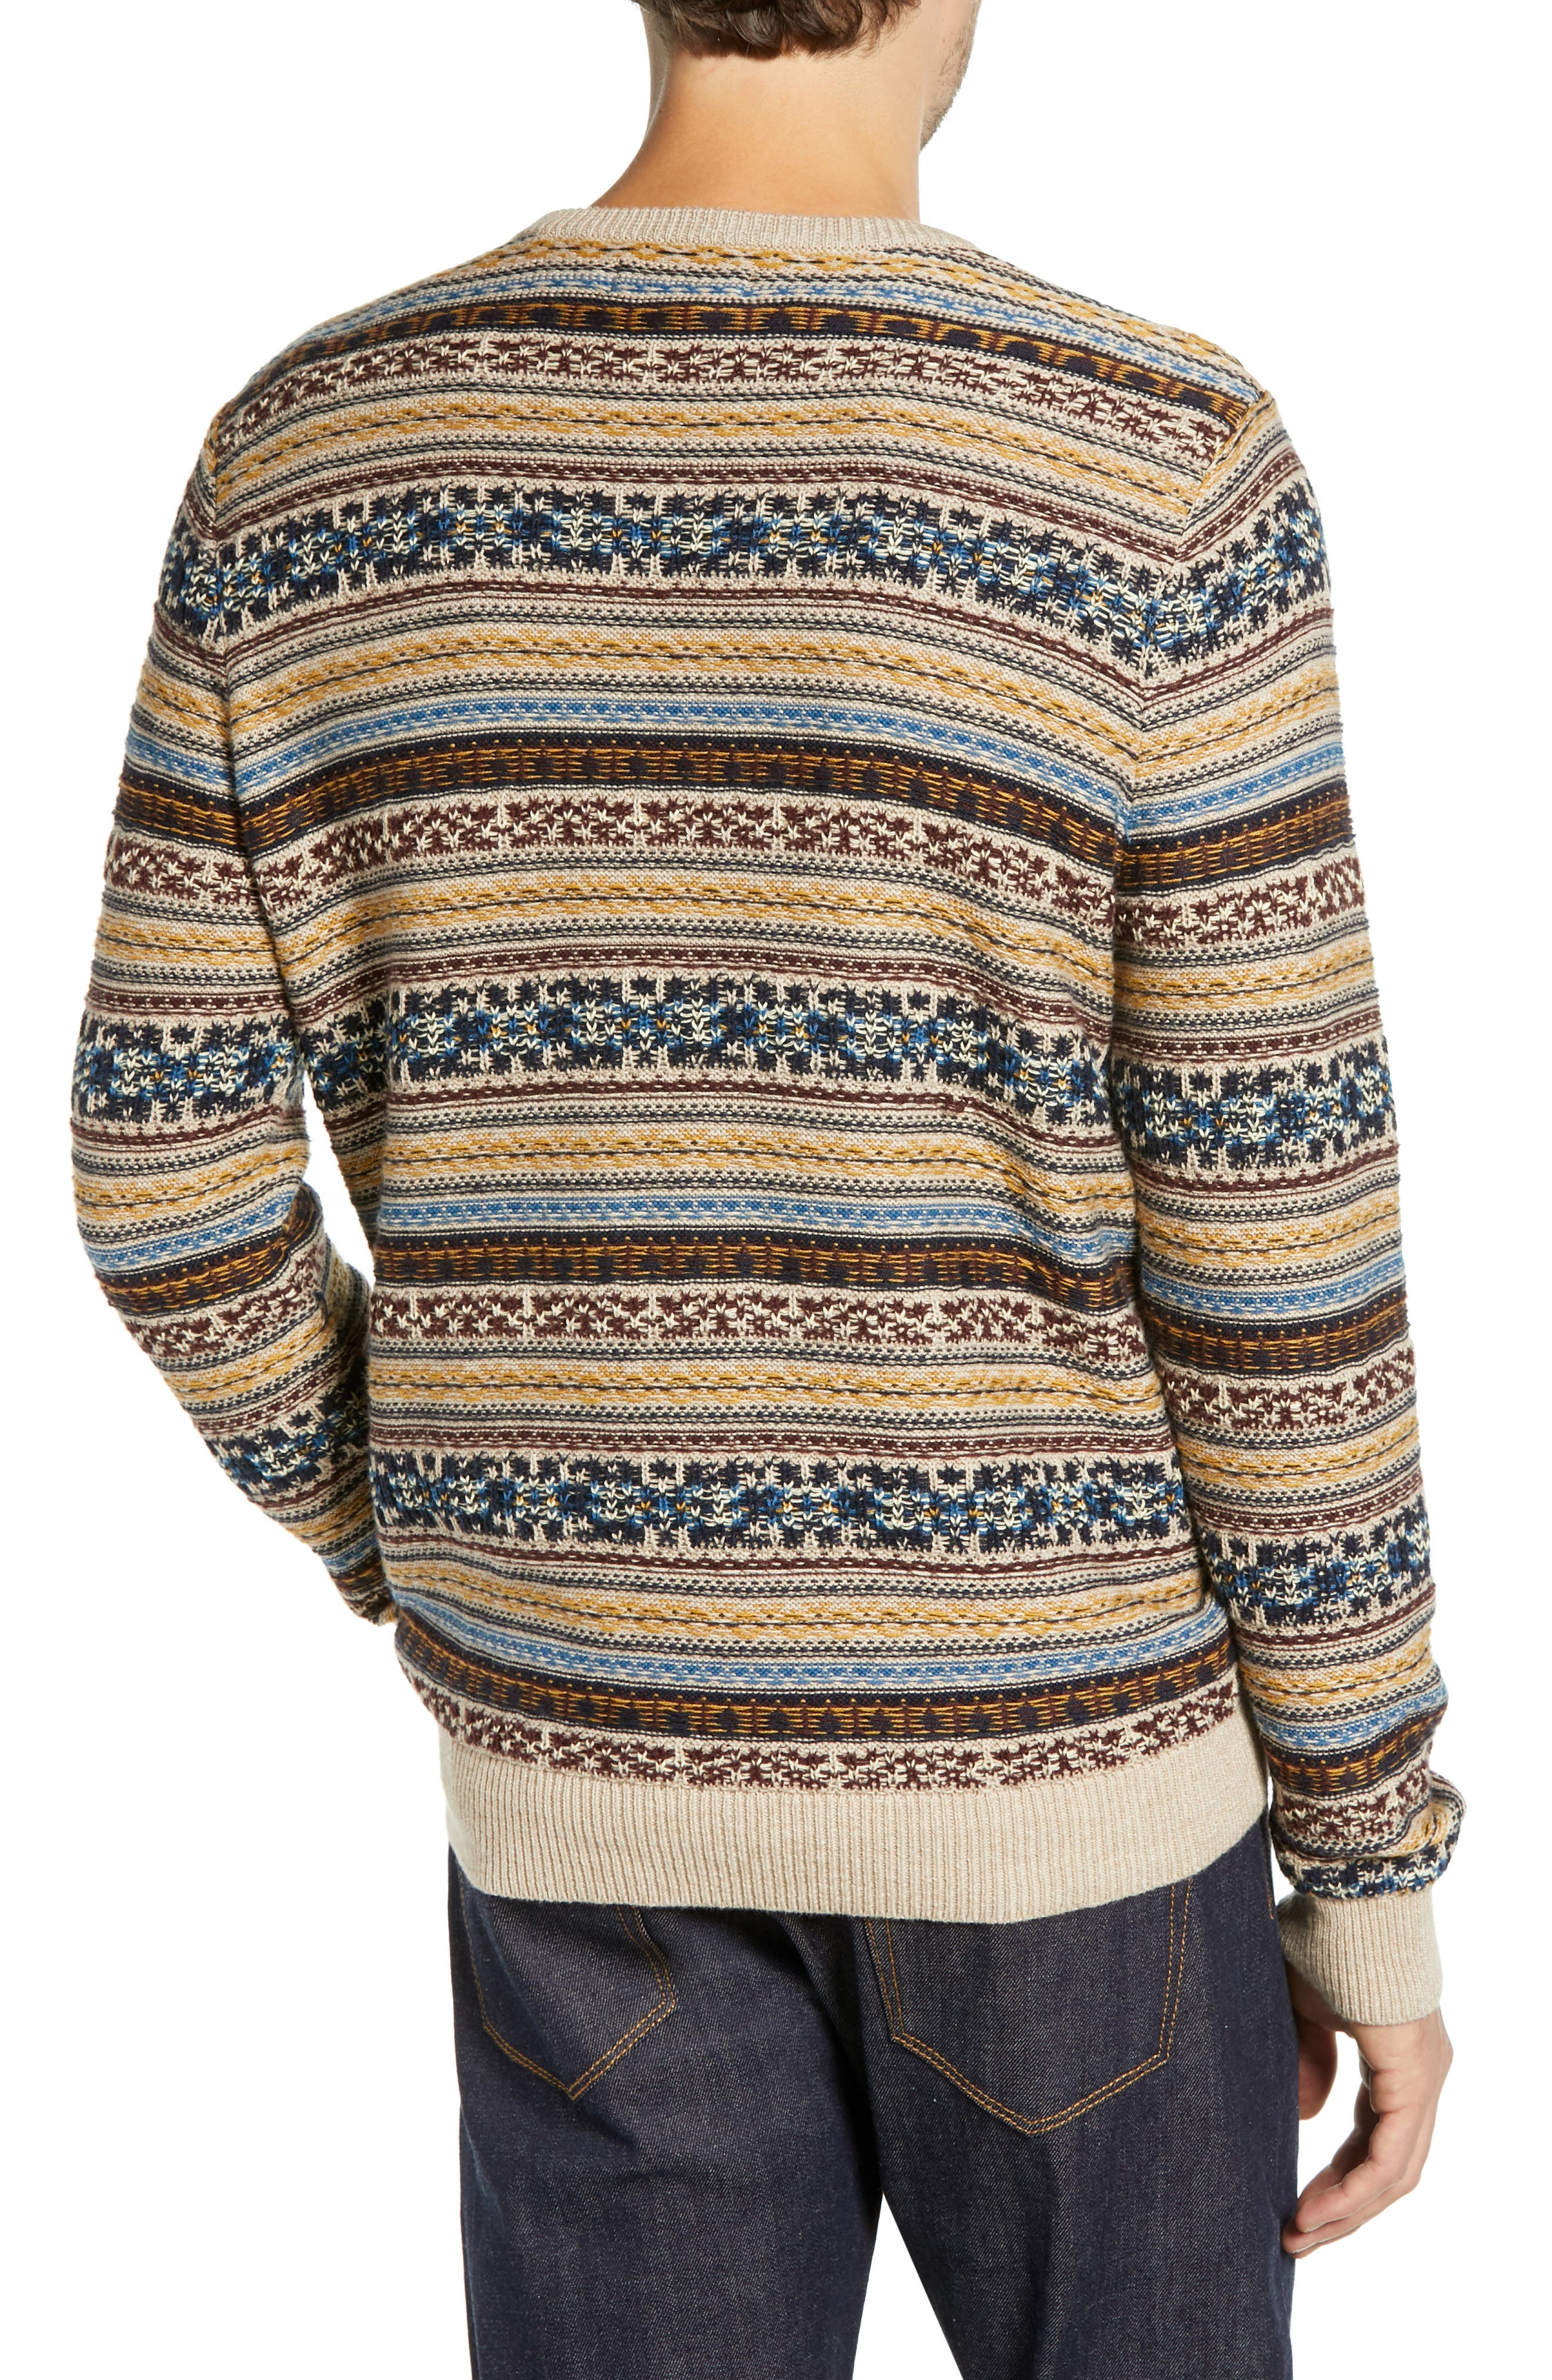 Regular Fit Fair Isle Crewneck Sweater,                             Alternate thumbnail 2, color,                             BROWN SIENA FAIRISLE